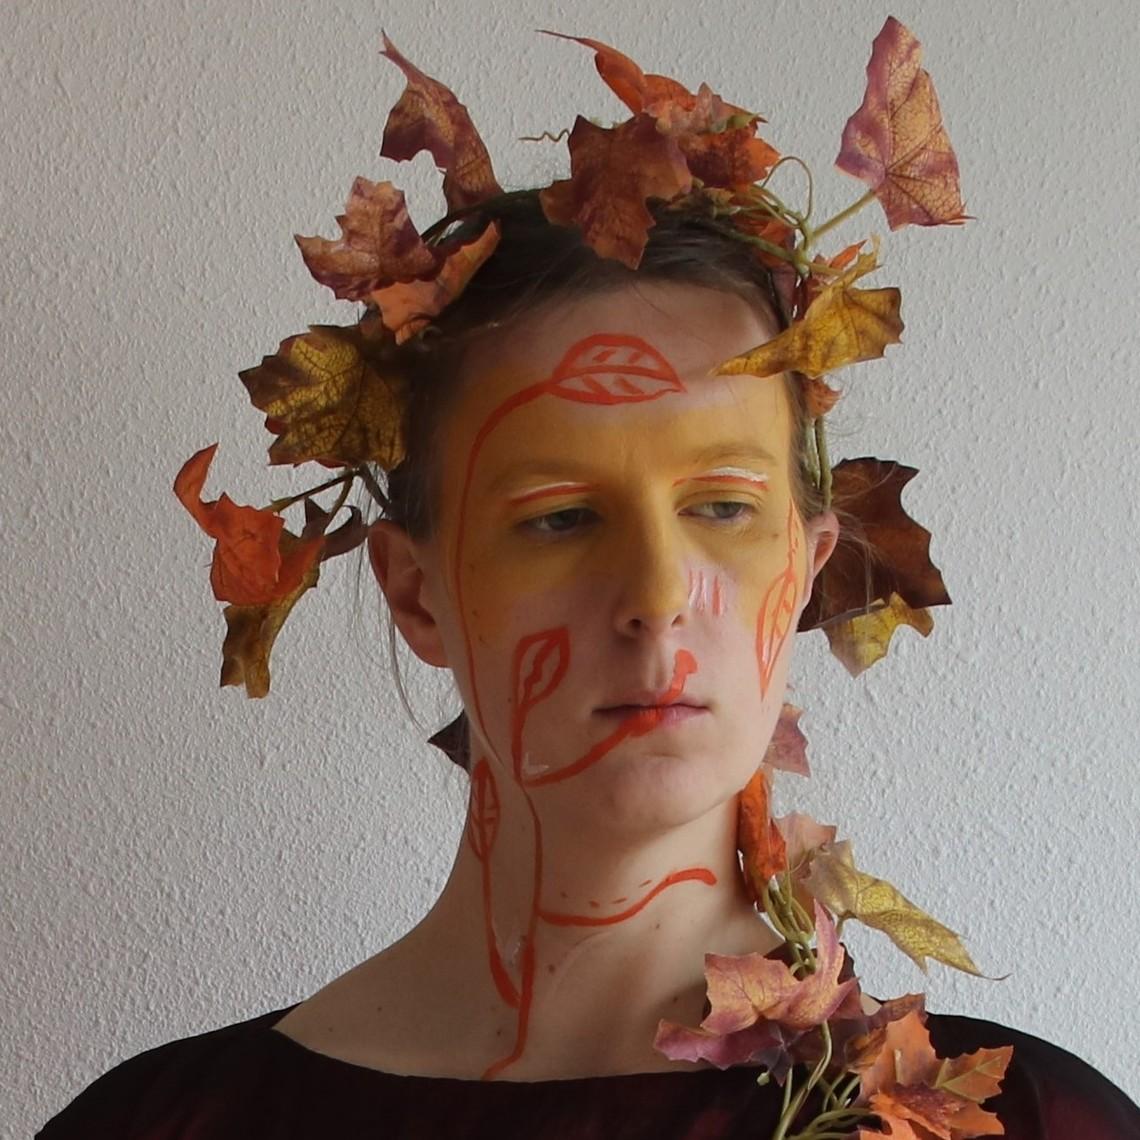 Epic Armoury Efecto épica umbra maquillaje